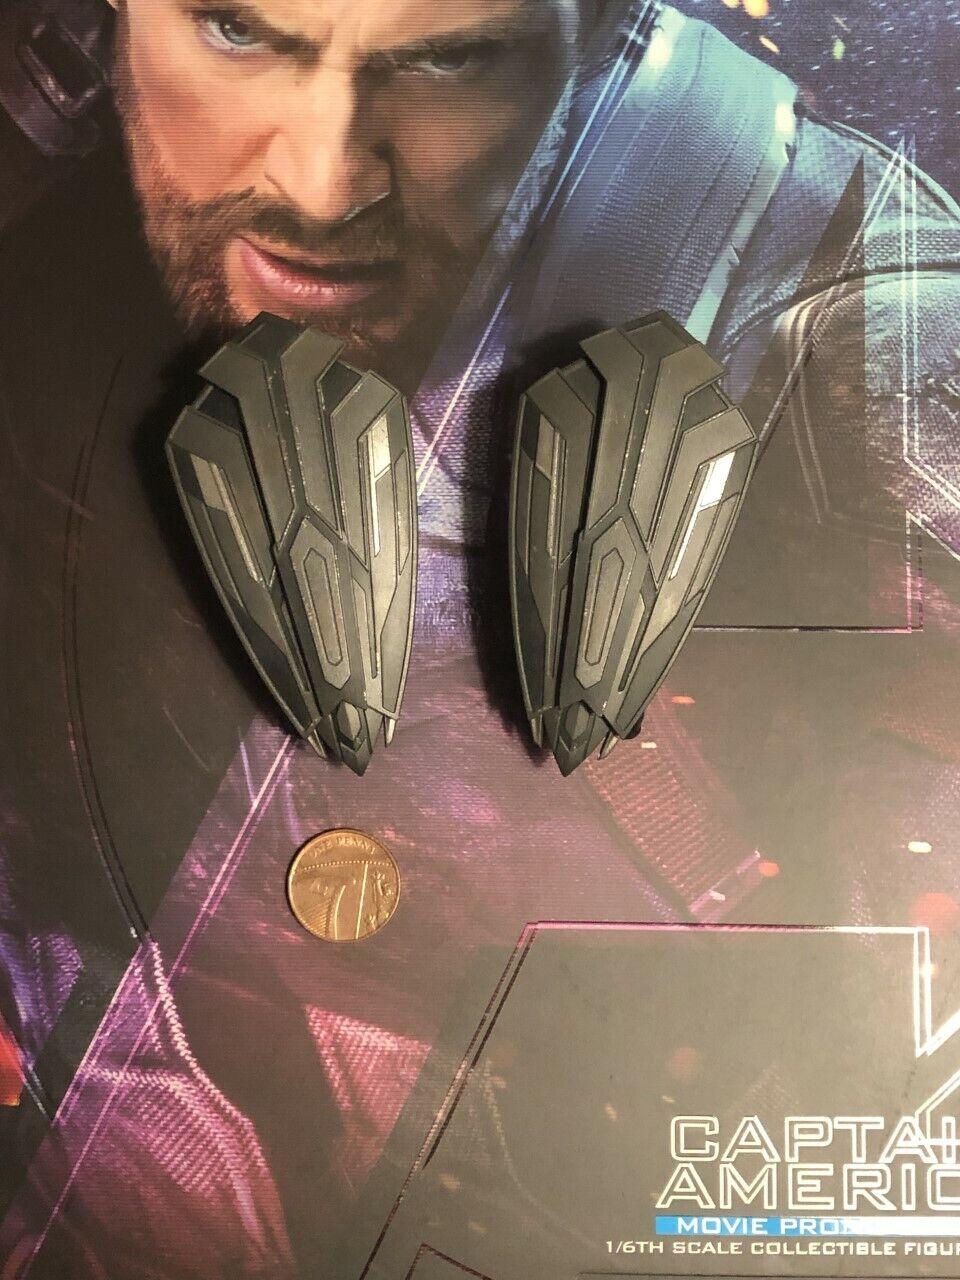 Hot Toys Captain America IW MMS481 Movie Promo Wakanda Shields loose échelle 1 6th